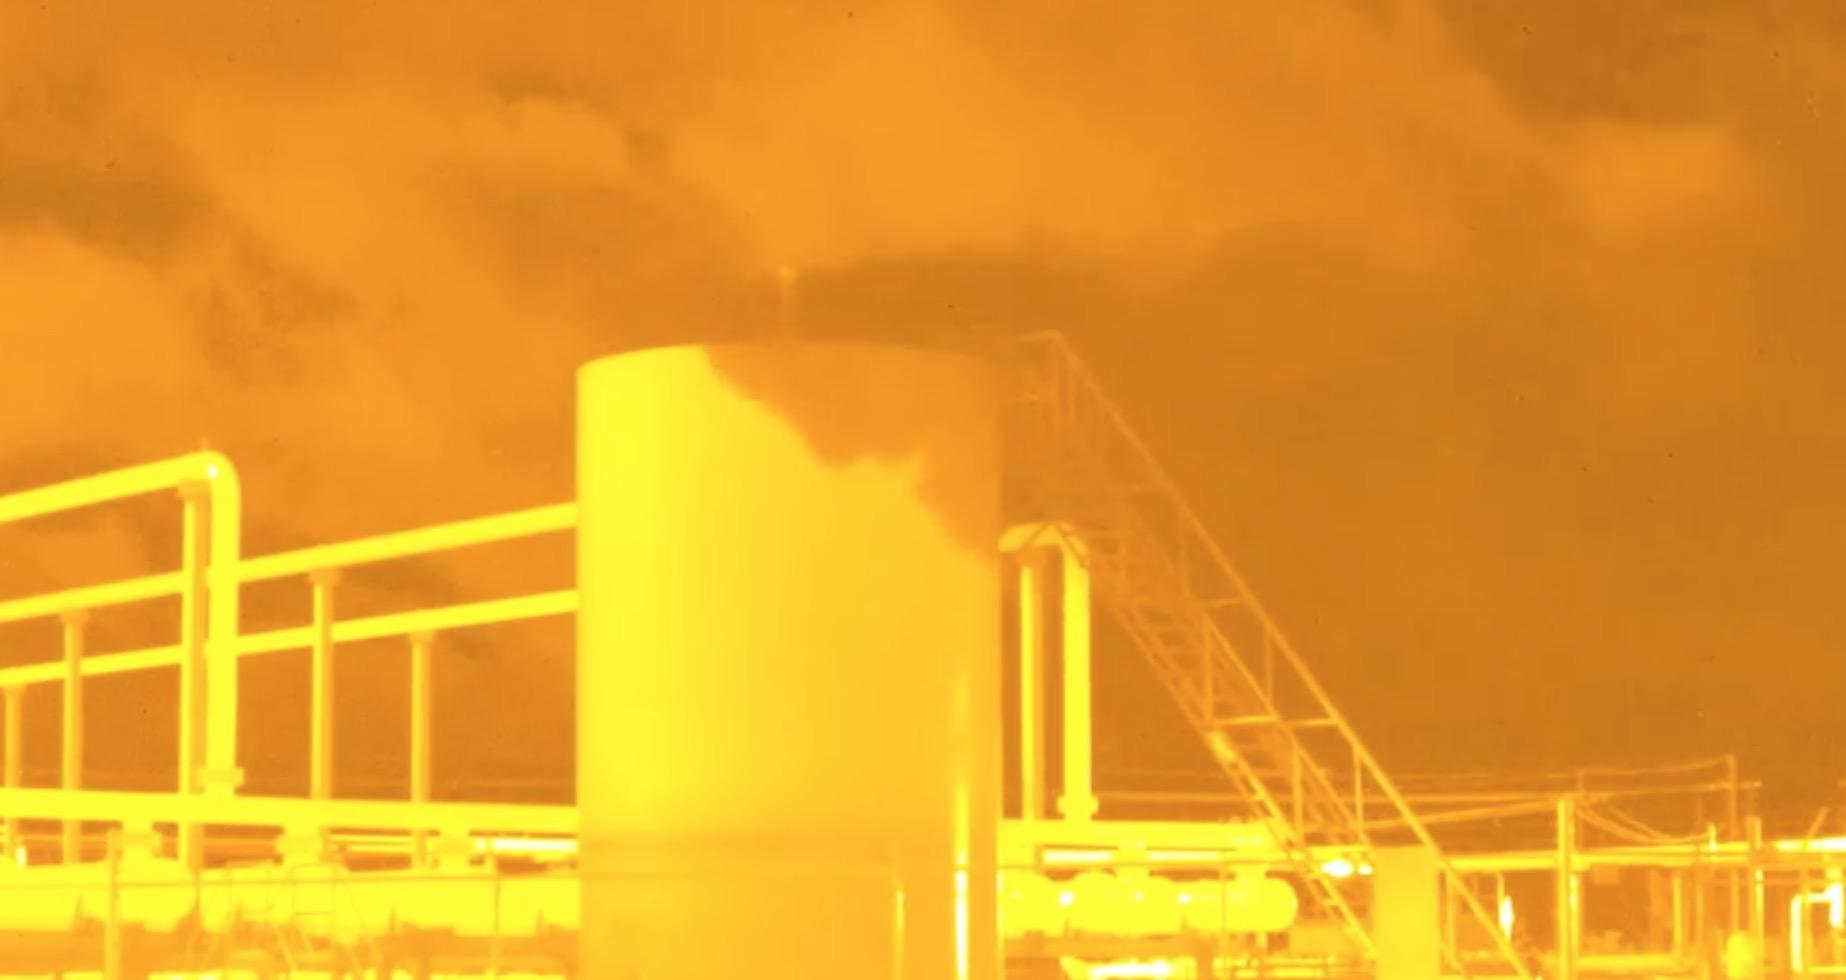 Exposing A Hidden Climate Threat: Methane 'Super Emitters'